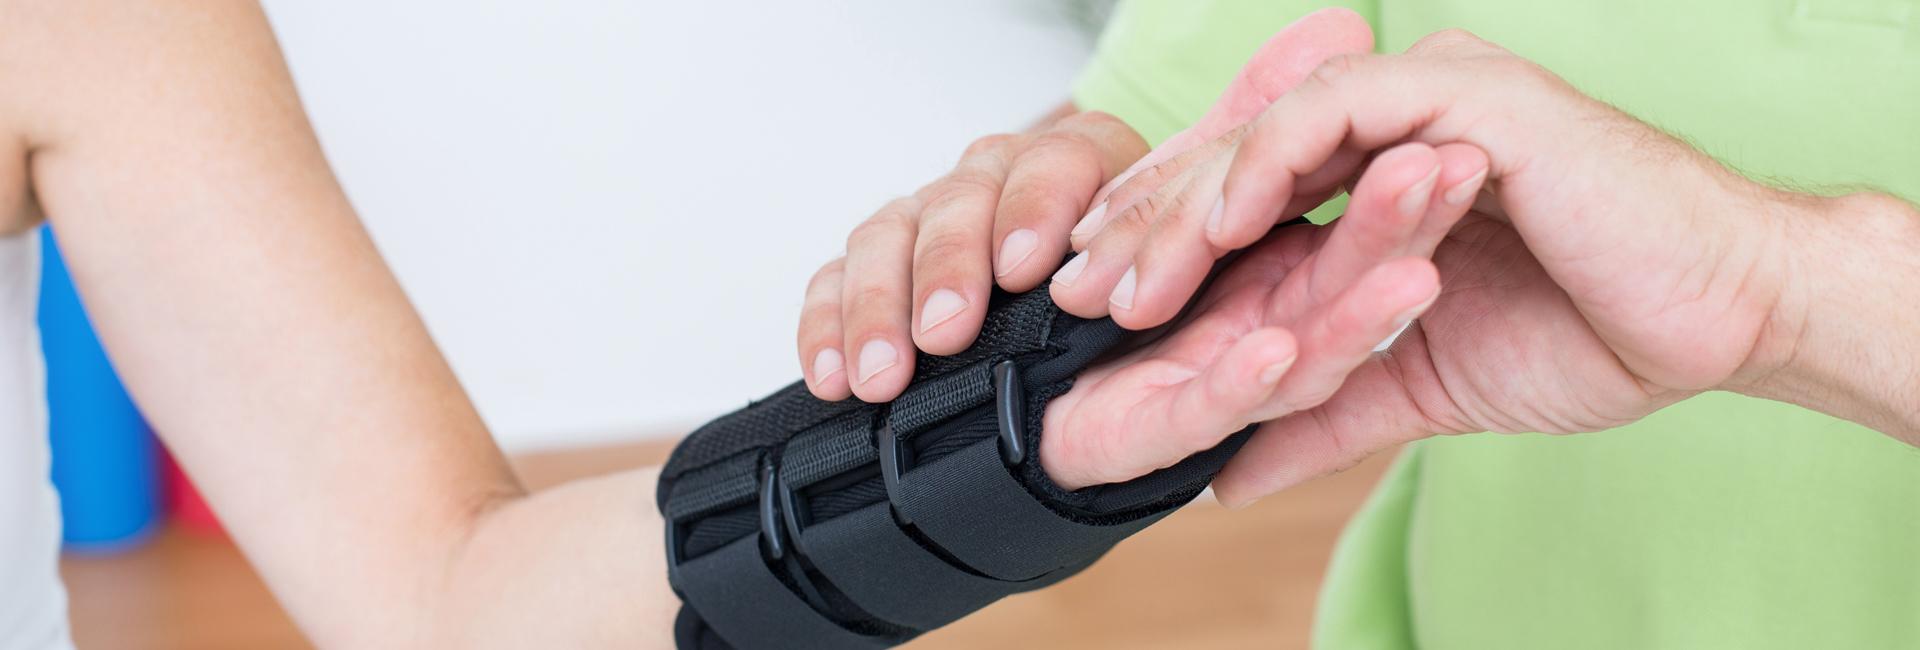 Wrist Rehabilitation